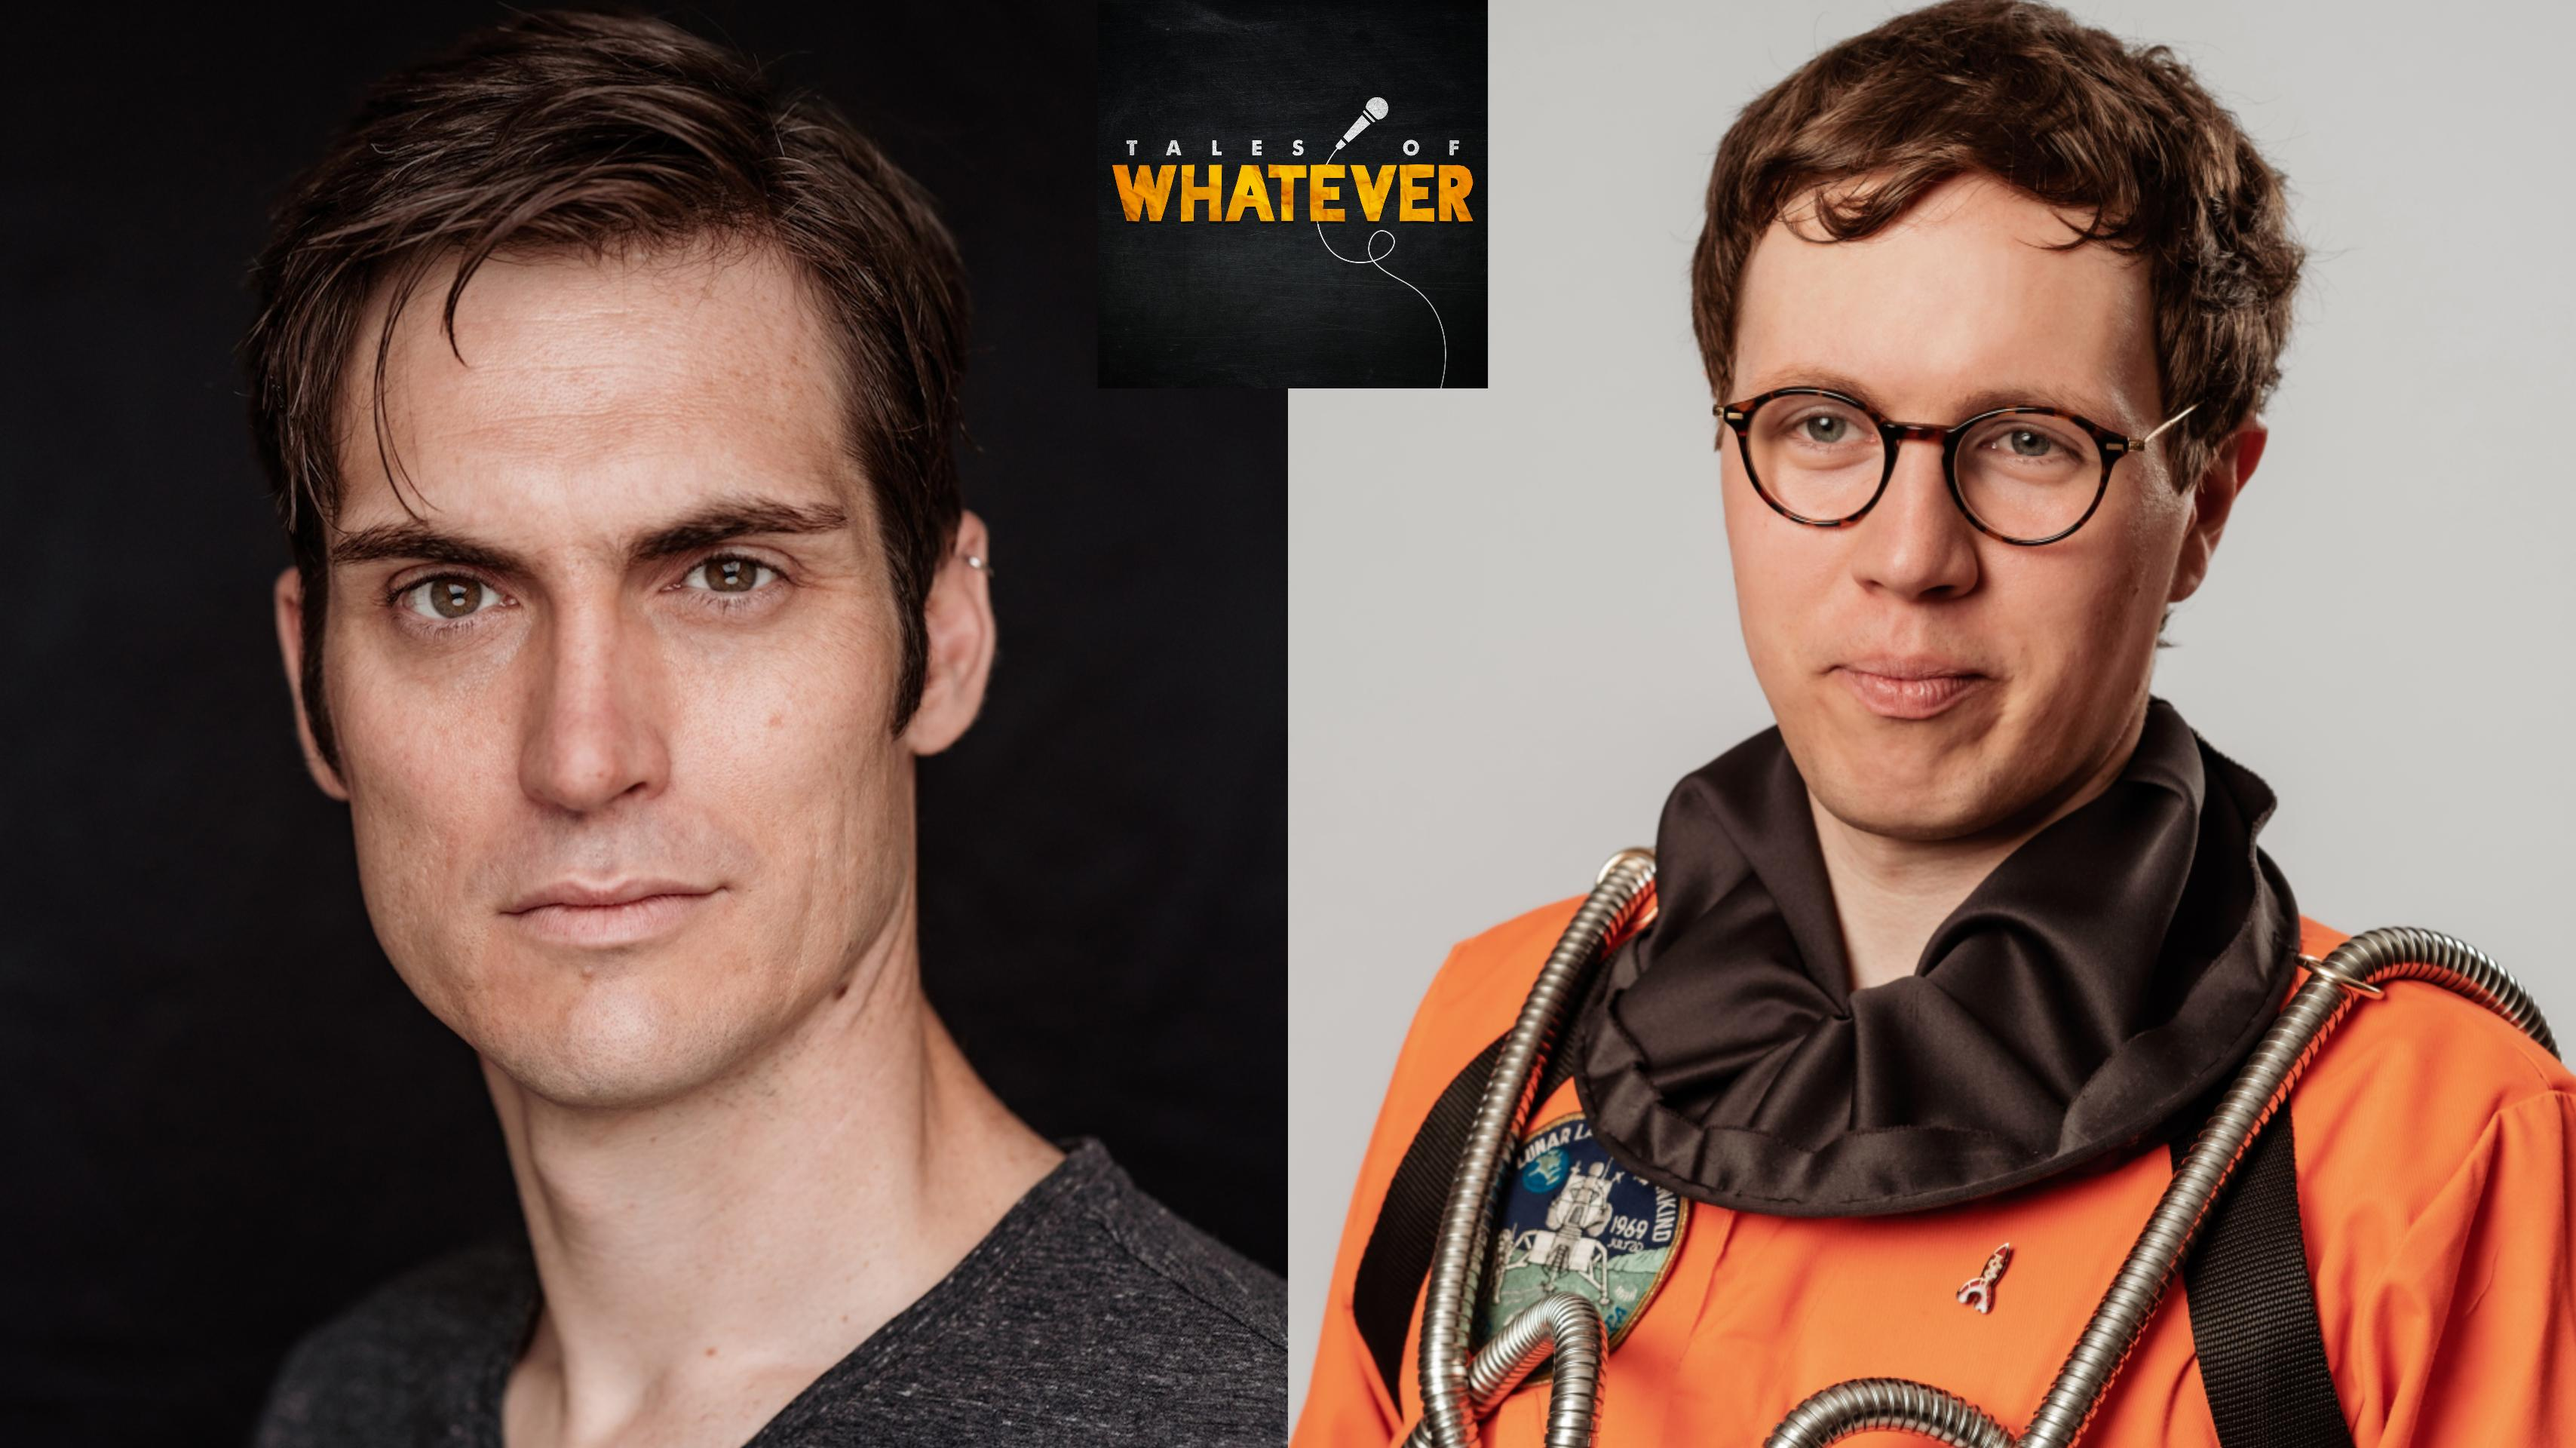 Tales of Whatever Presents Sam Nicoresti & Rob Kemp